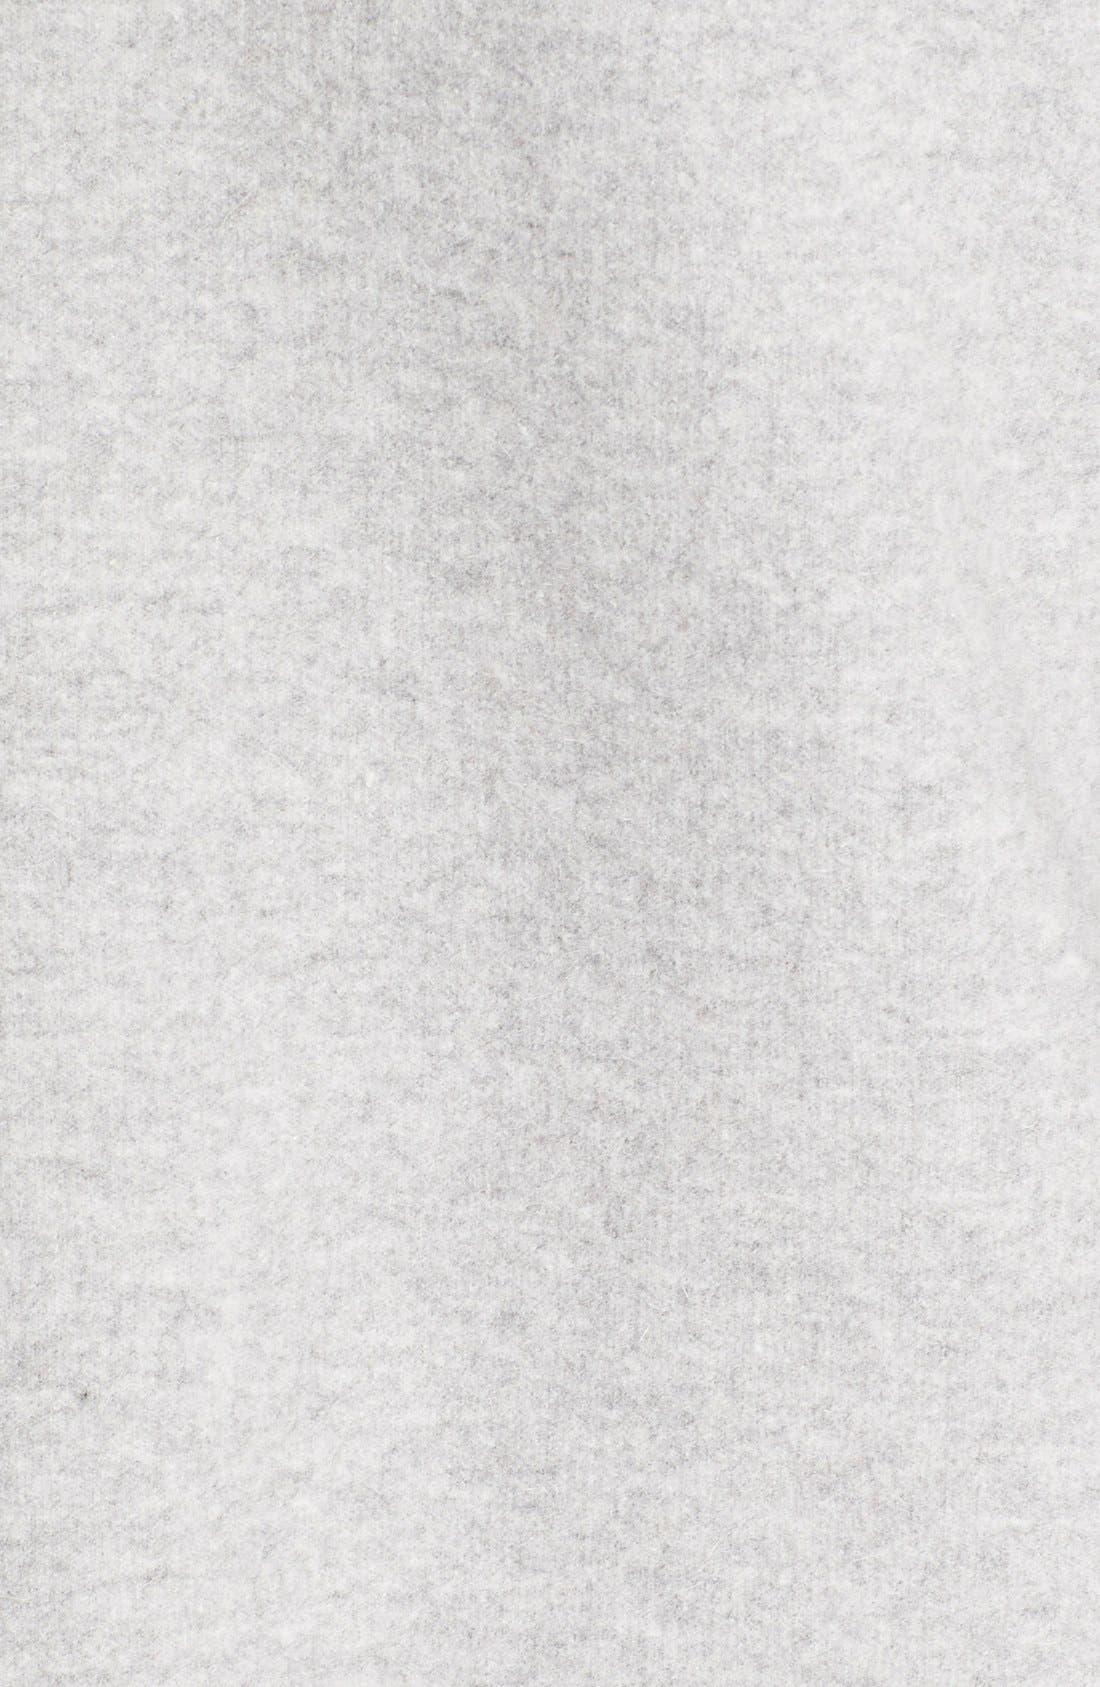 THEORY,                             'Nyma K' Merino Wool Blend Coat,                             Alternate thumbnail 2, color,                             092